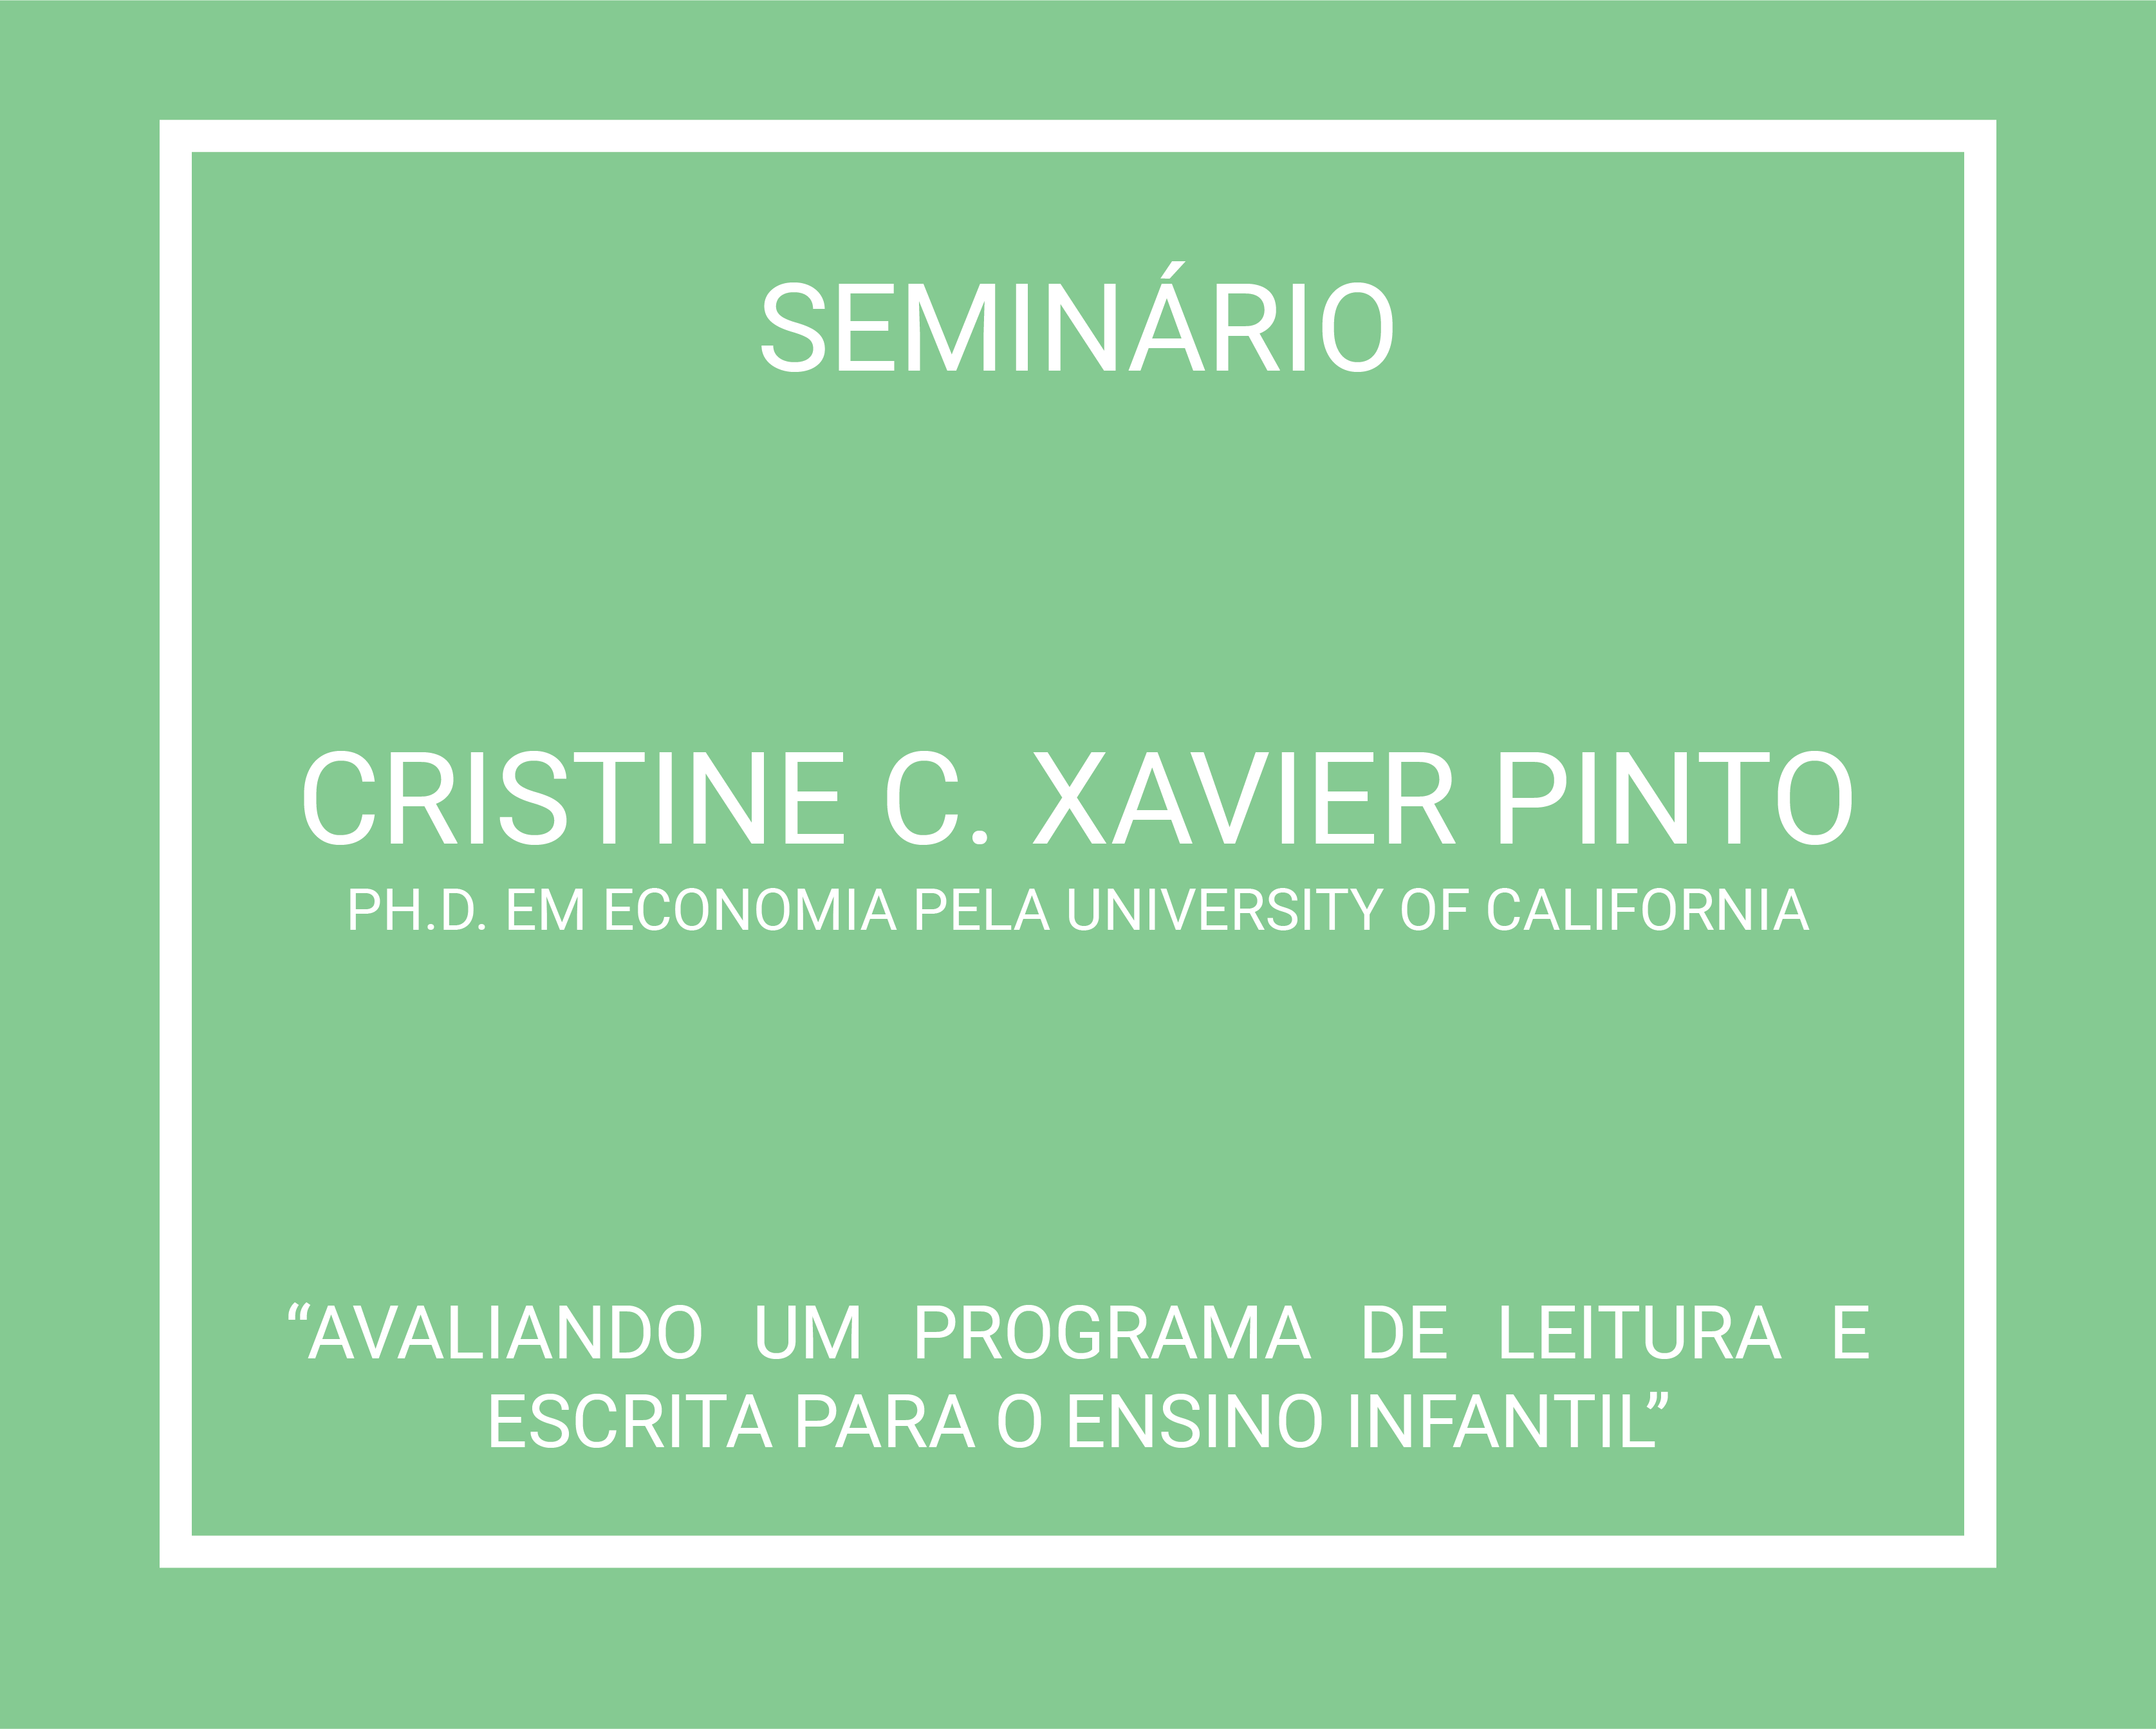 Cristine C Xavier Pinto